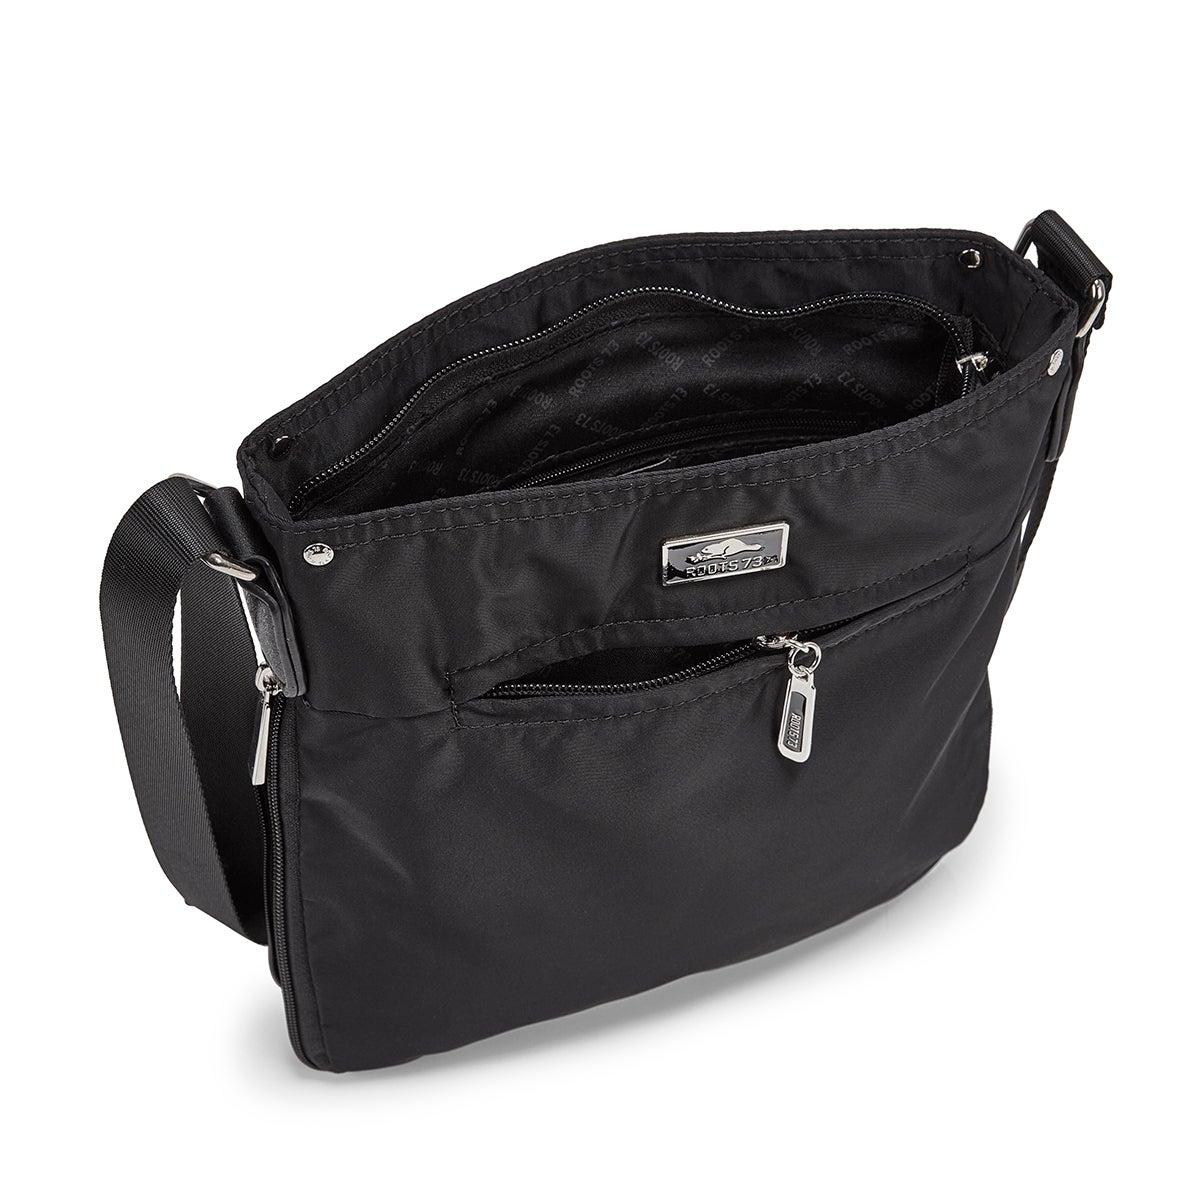 Lds black north/south cross body bag